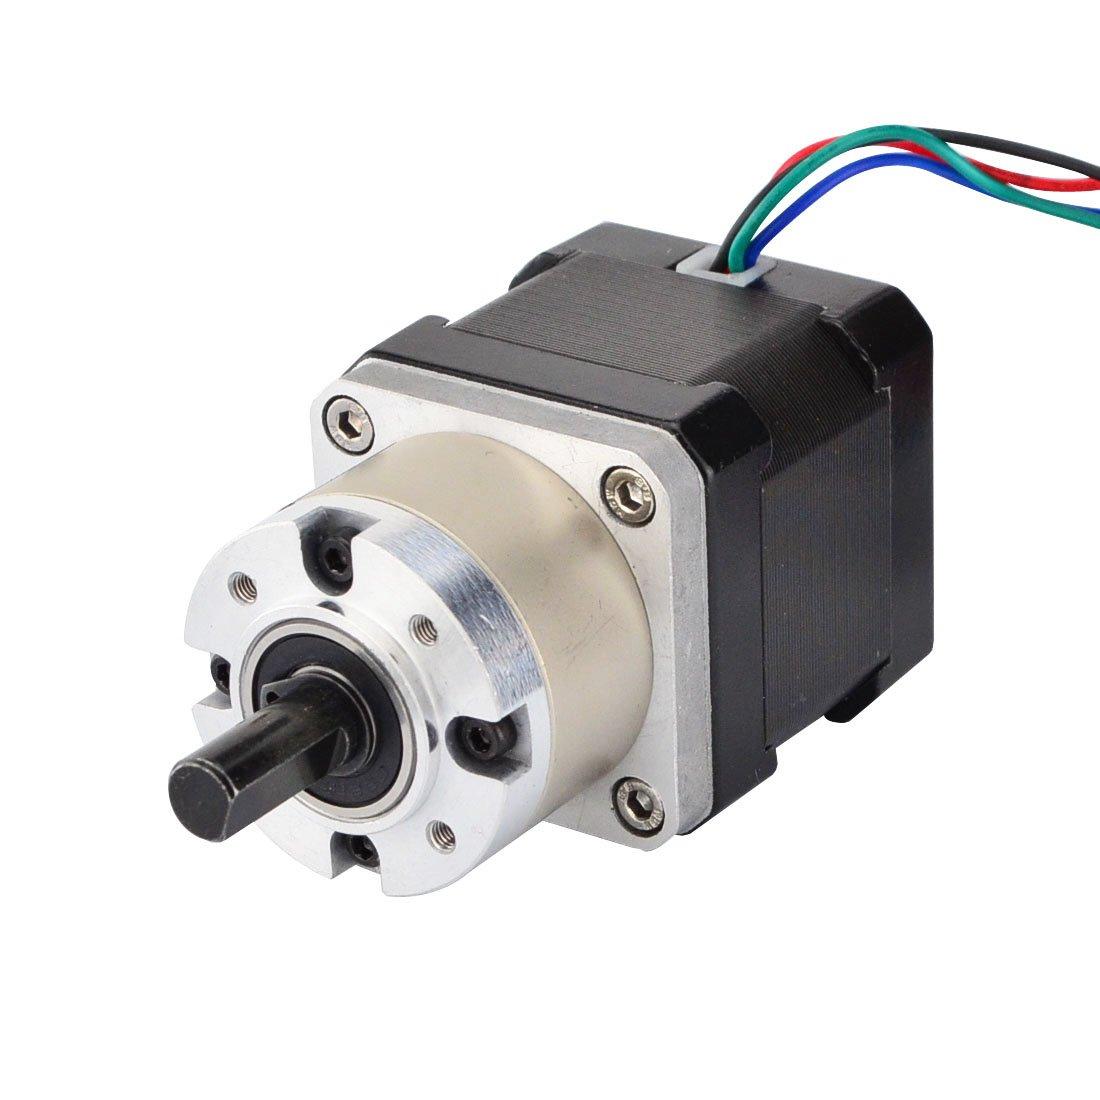 STEPPERONLINE 5:1 Planetary Gearbox Nema 17 Geared Stepper Motor 1.68A for DIY 3D Printer/CNC Extruder 17HS15-1684S-PG5